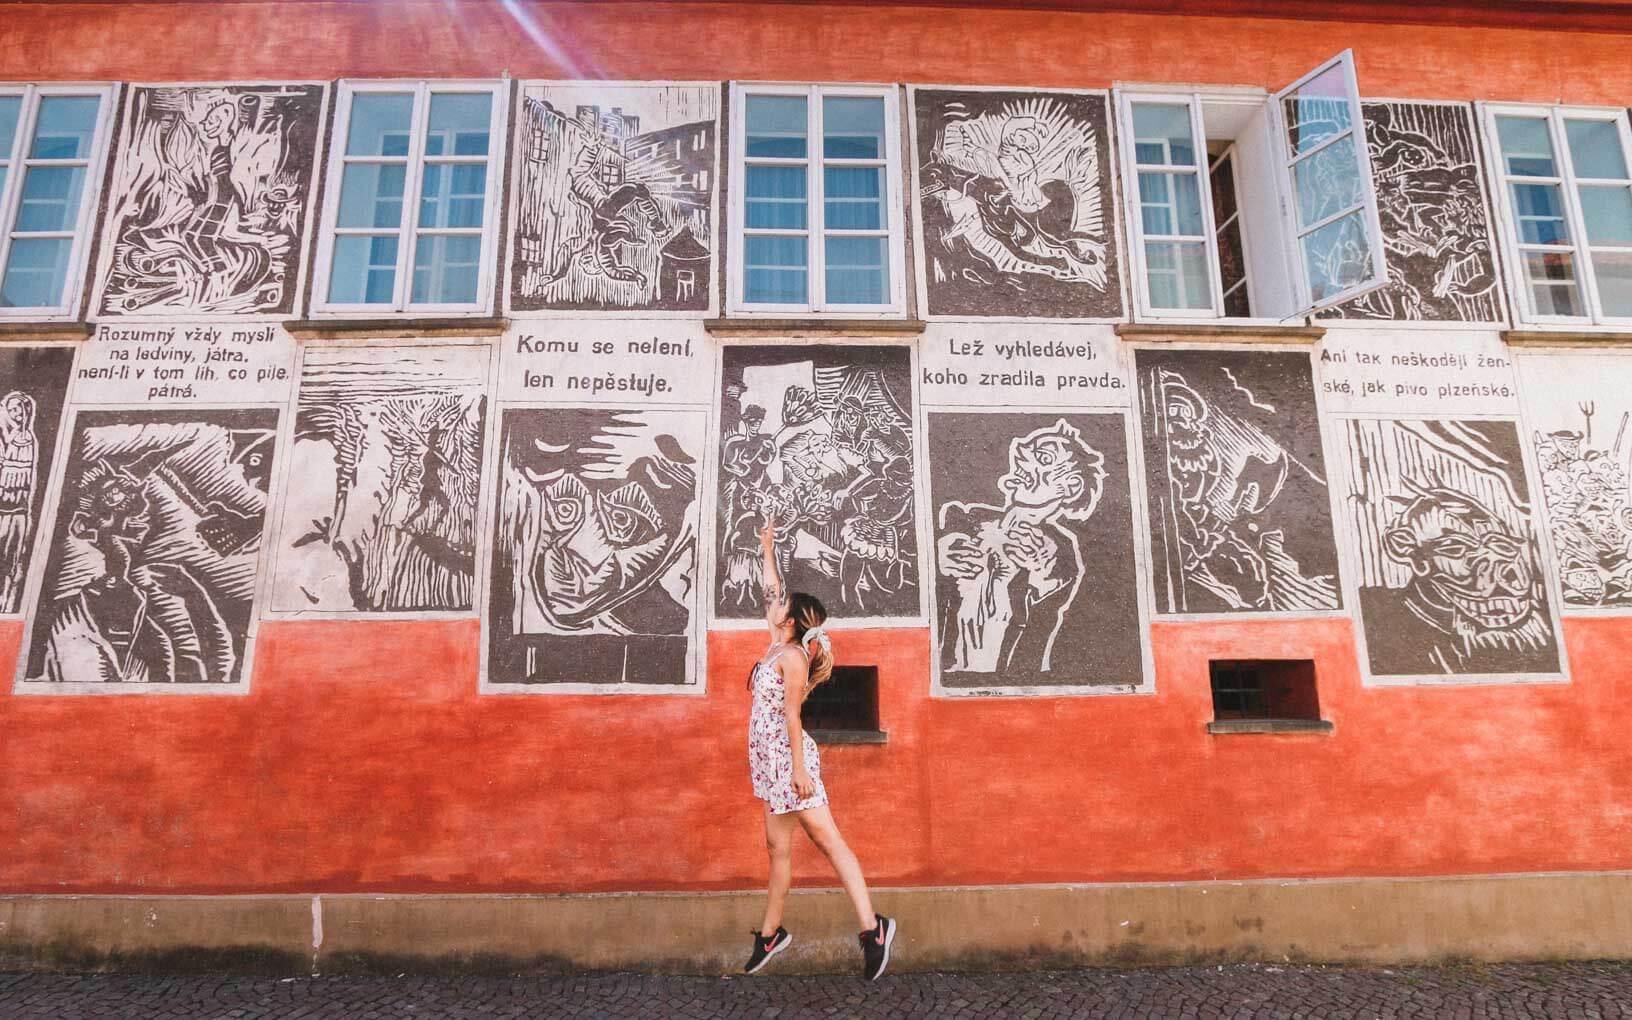 Josefa Váchala street art - Visit Litomysl in Czech Republic